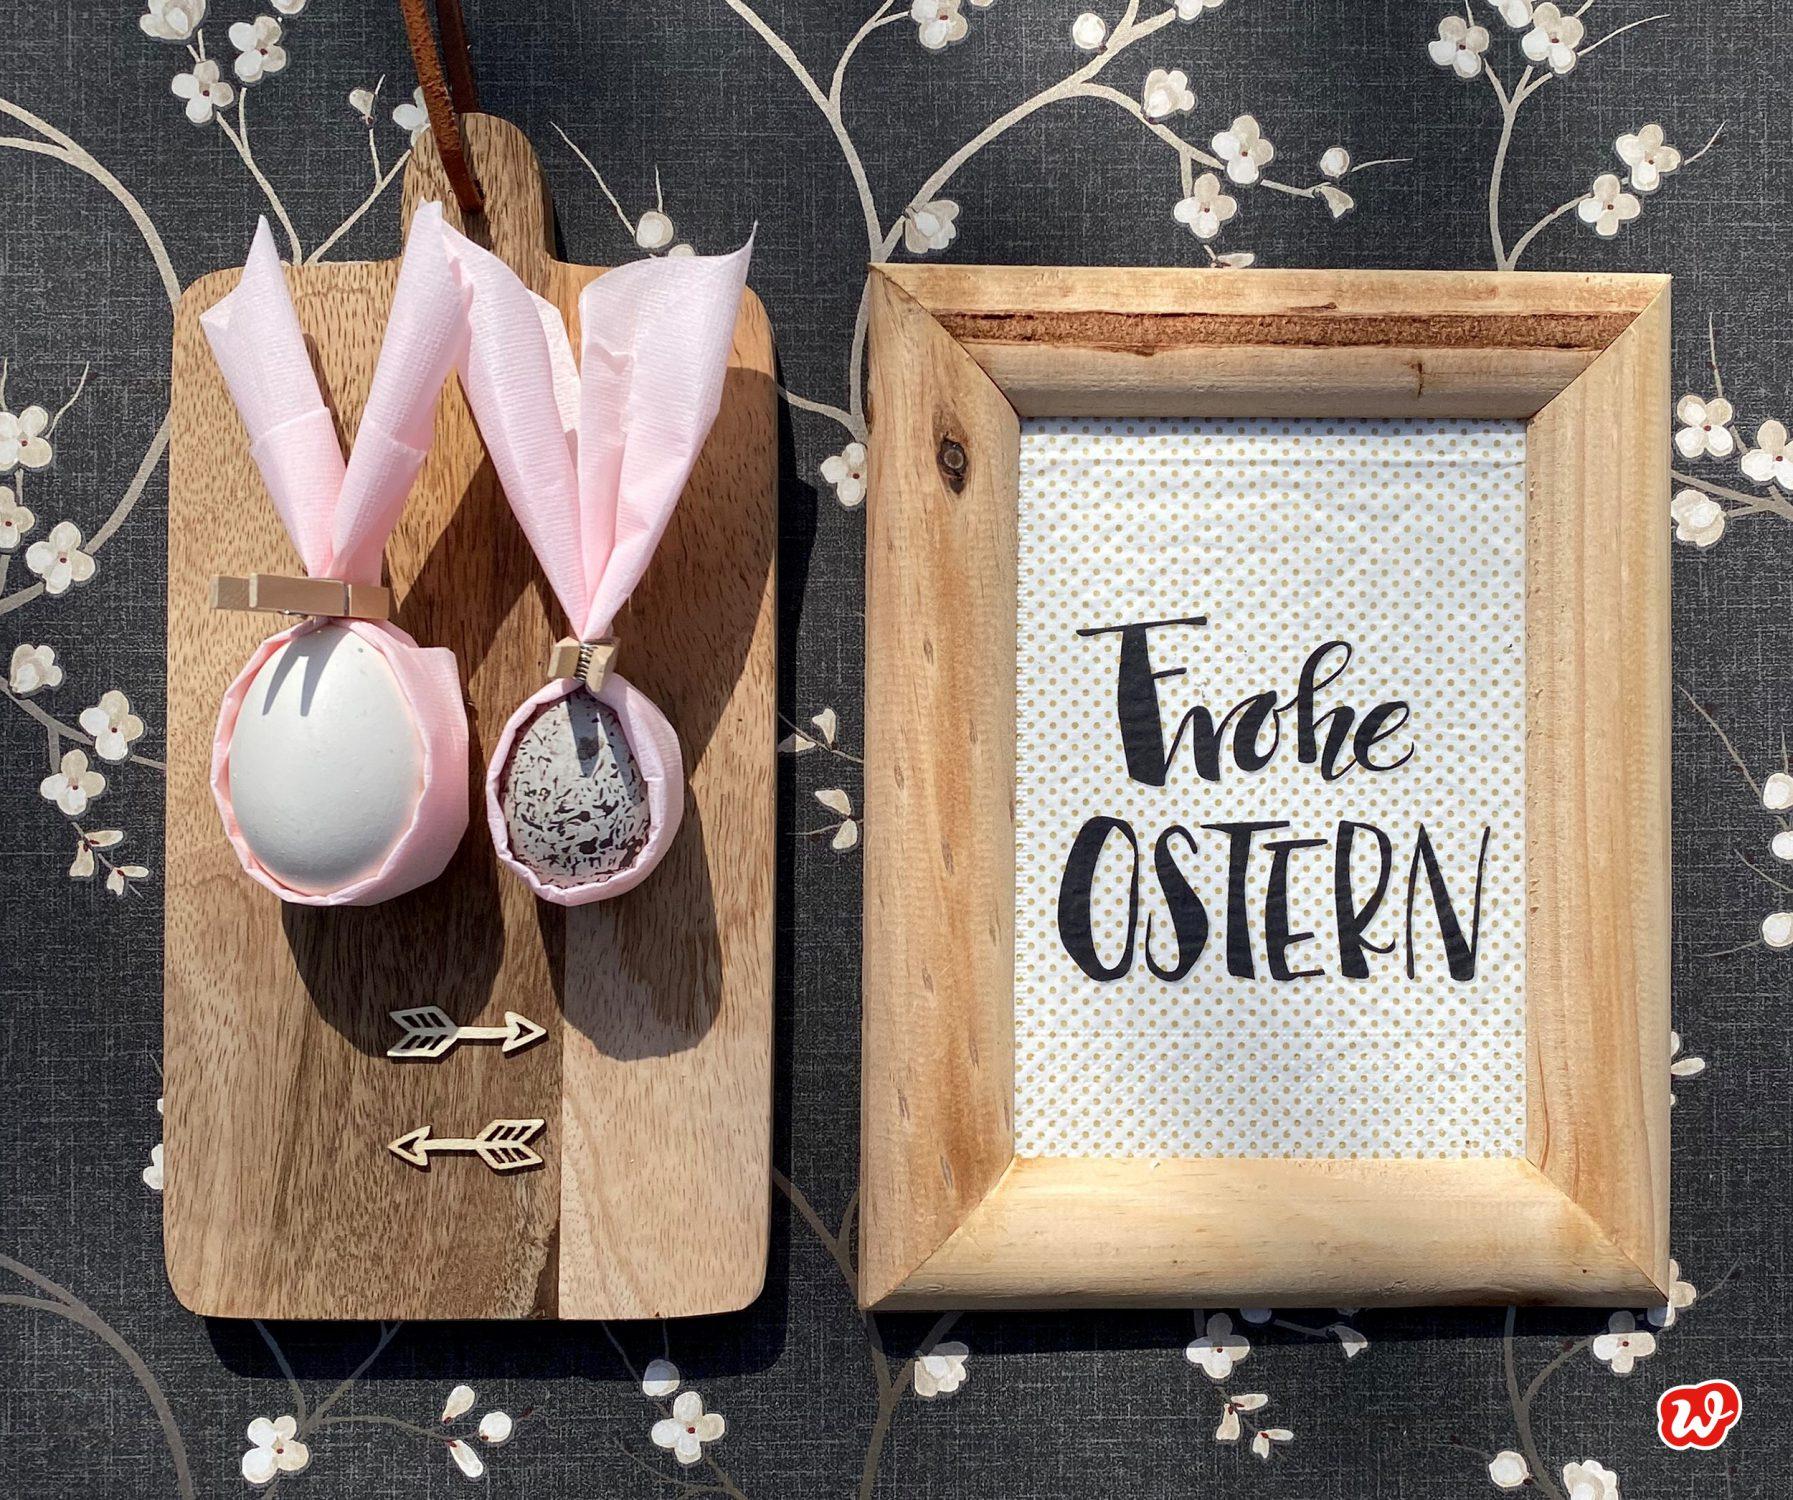 Ostereier mit rosa Hasenohren in Osterszenerie